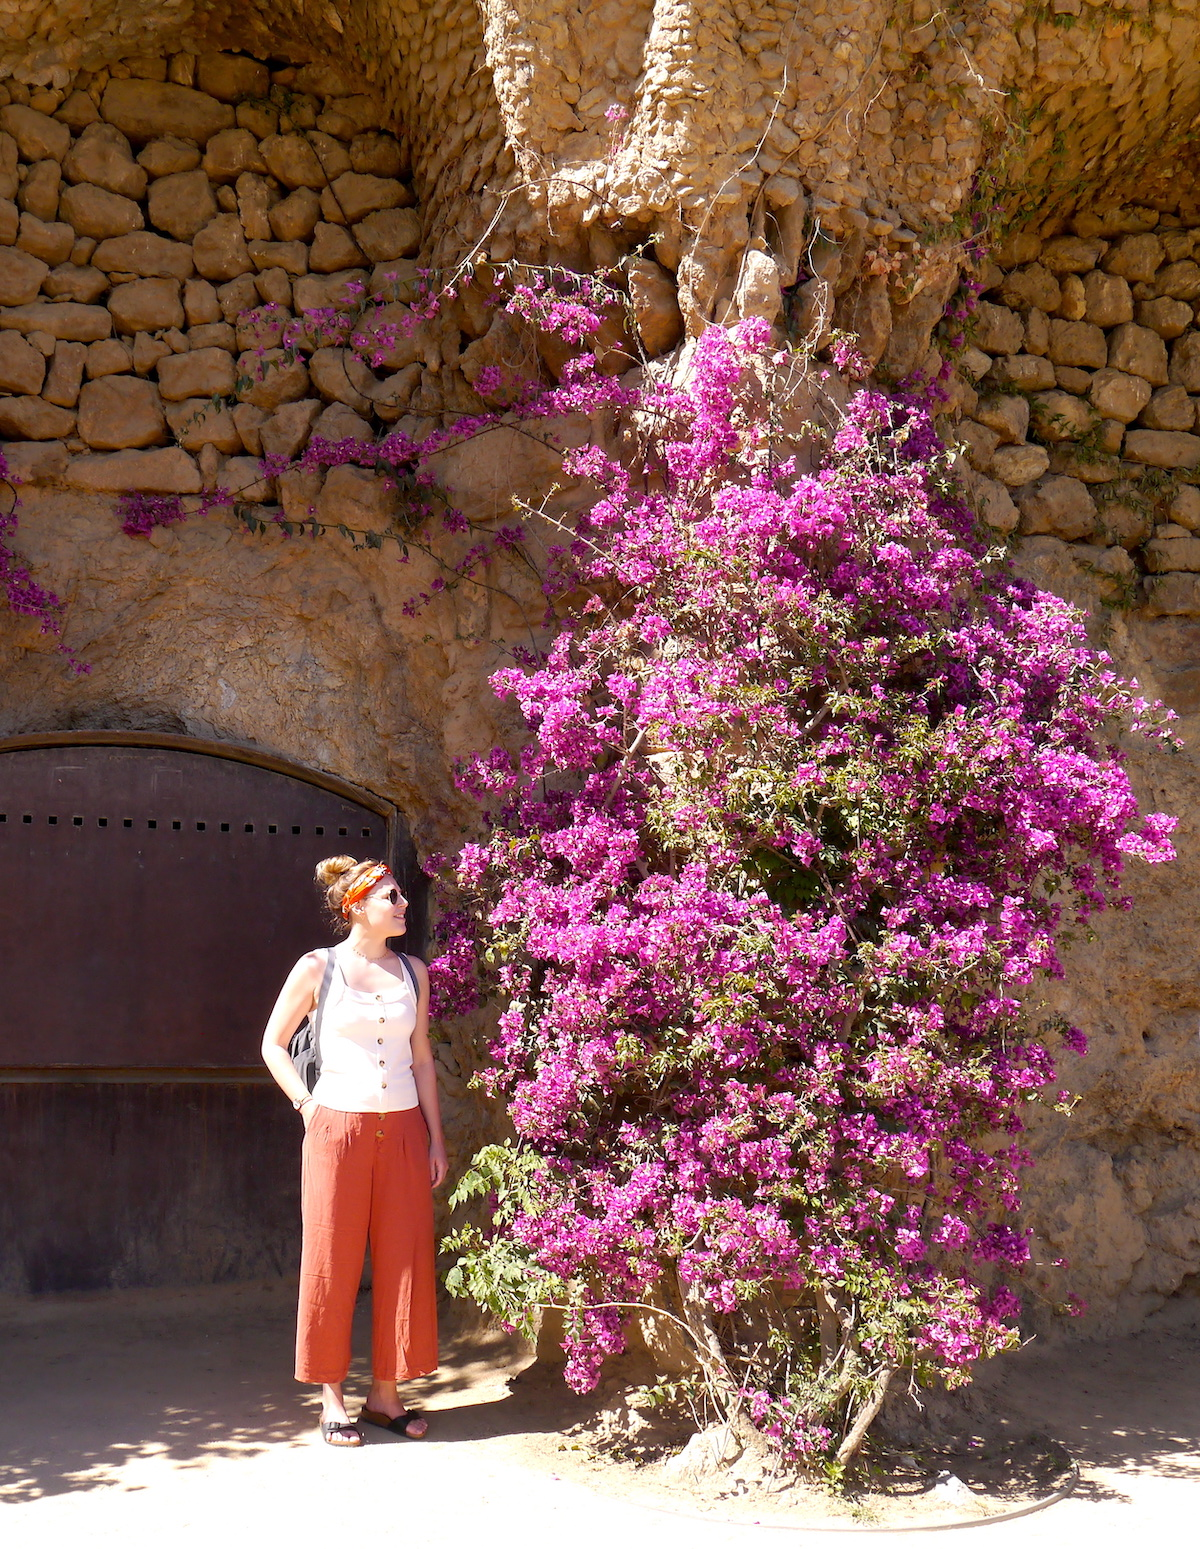 Flowers, 3 days in Barcelona